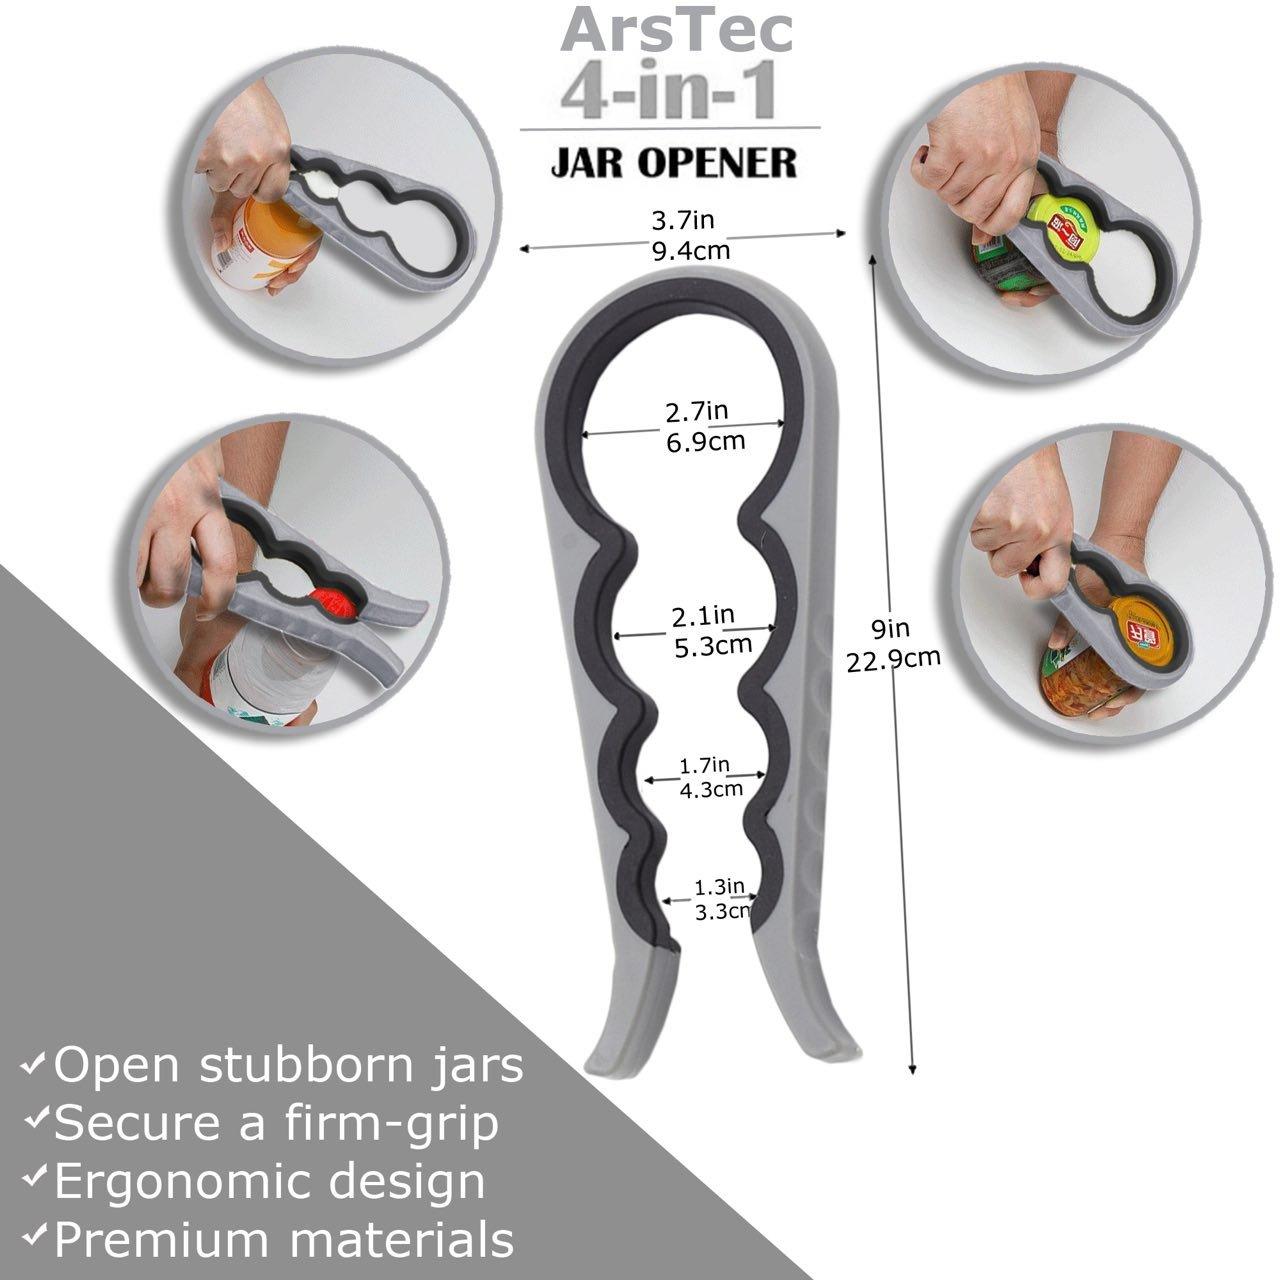 Arstec Jar Bottle Opener Non Slip Jar Gripper Pad - Rubber Jar Can Lid Opener for Weak, Senior, Arthritis Hands (Gray) by ArsTec (Image #2)